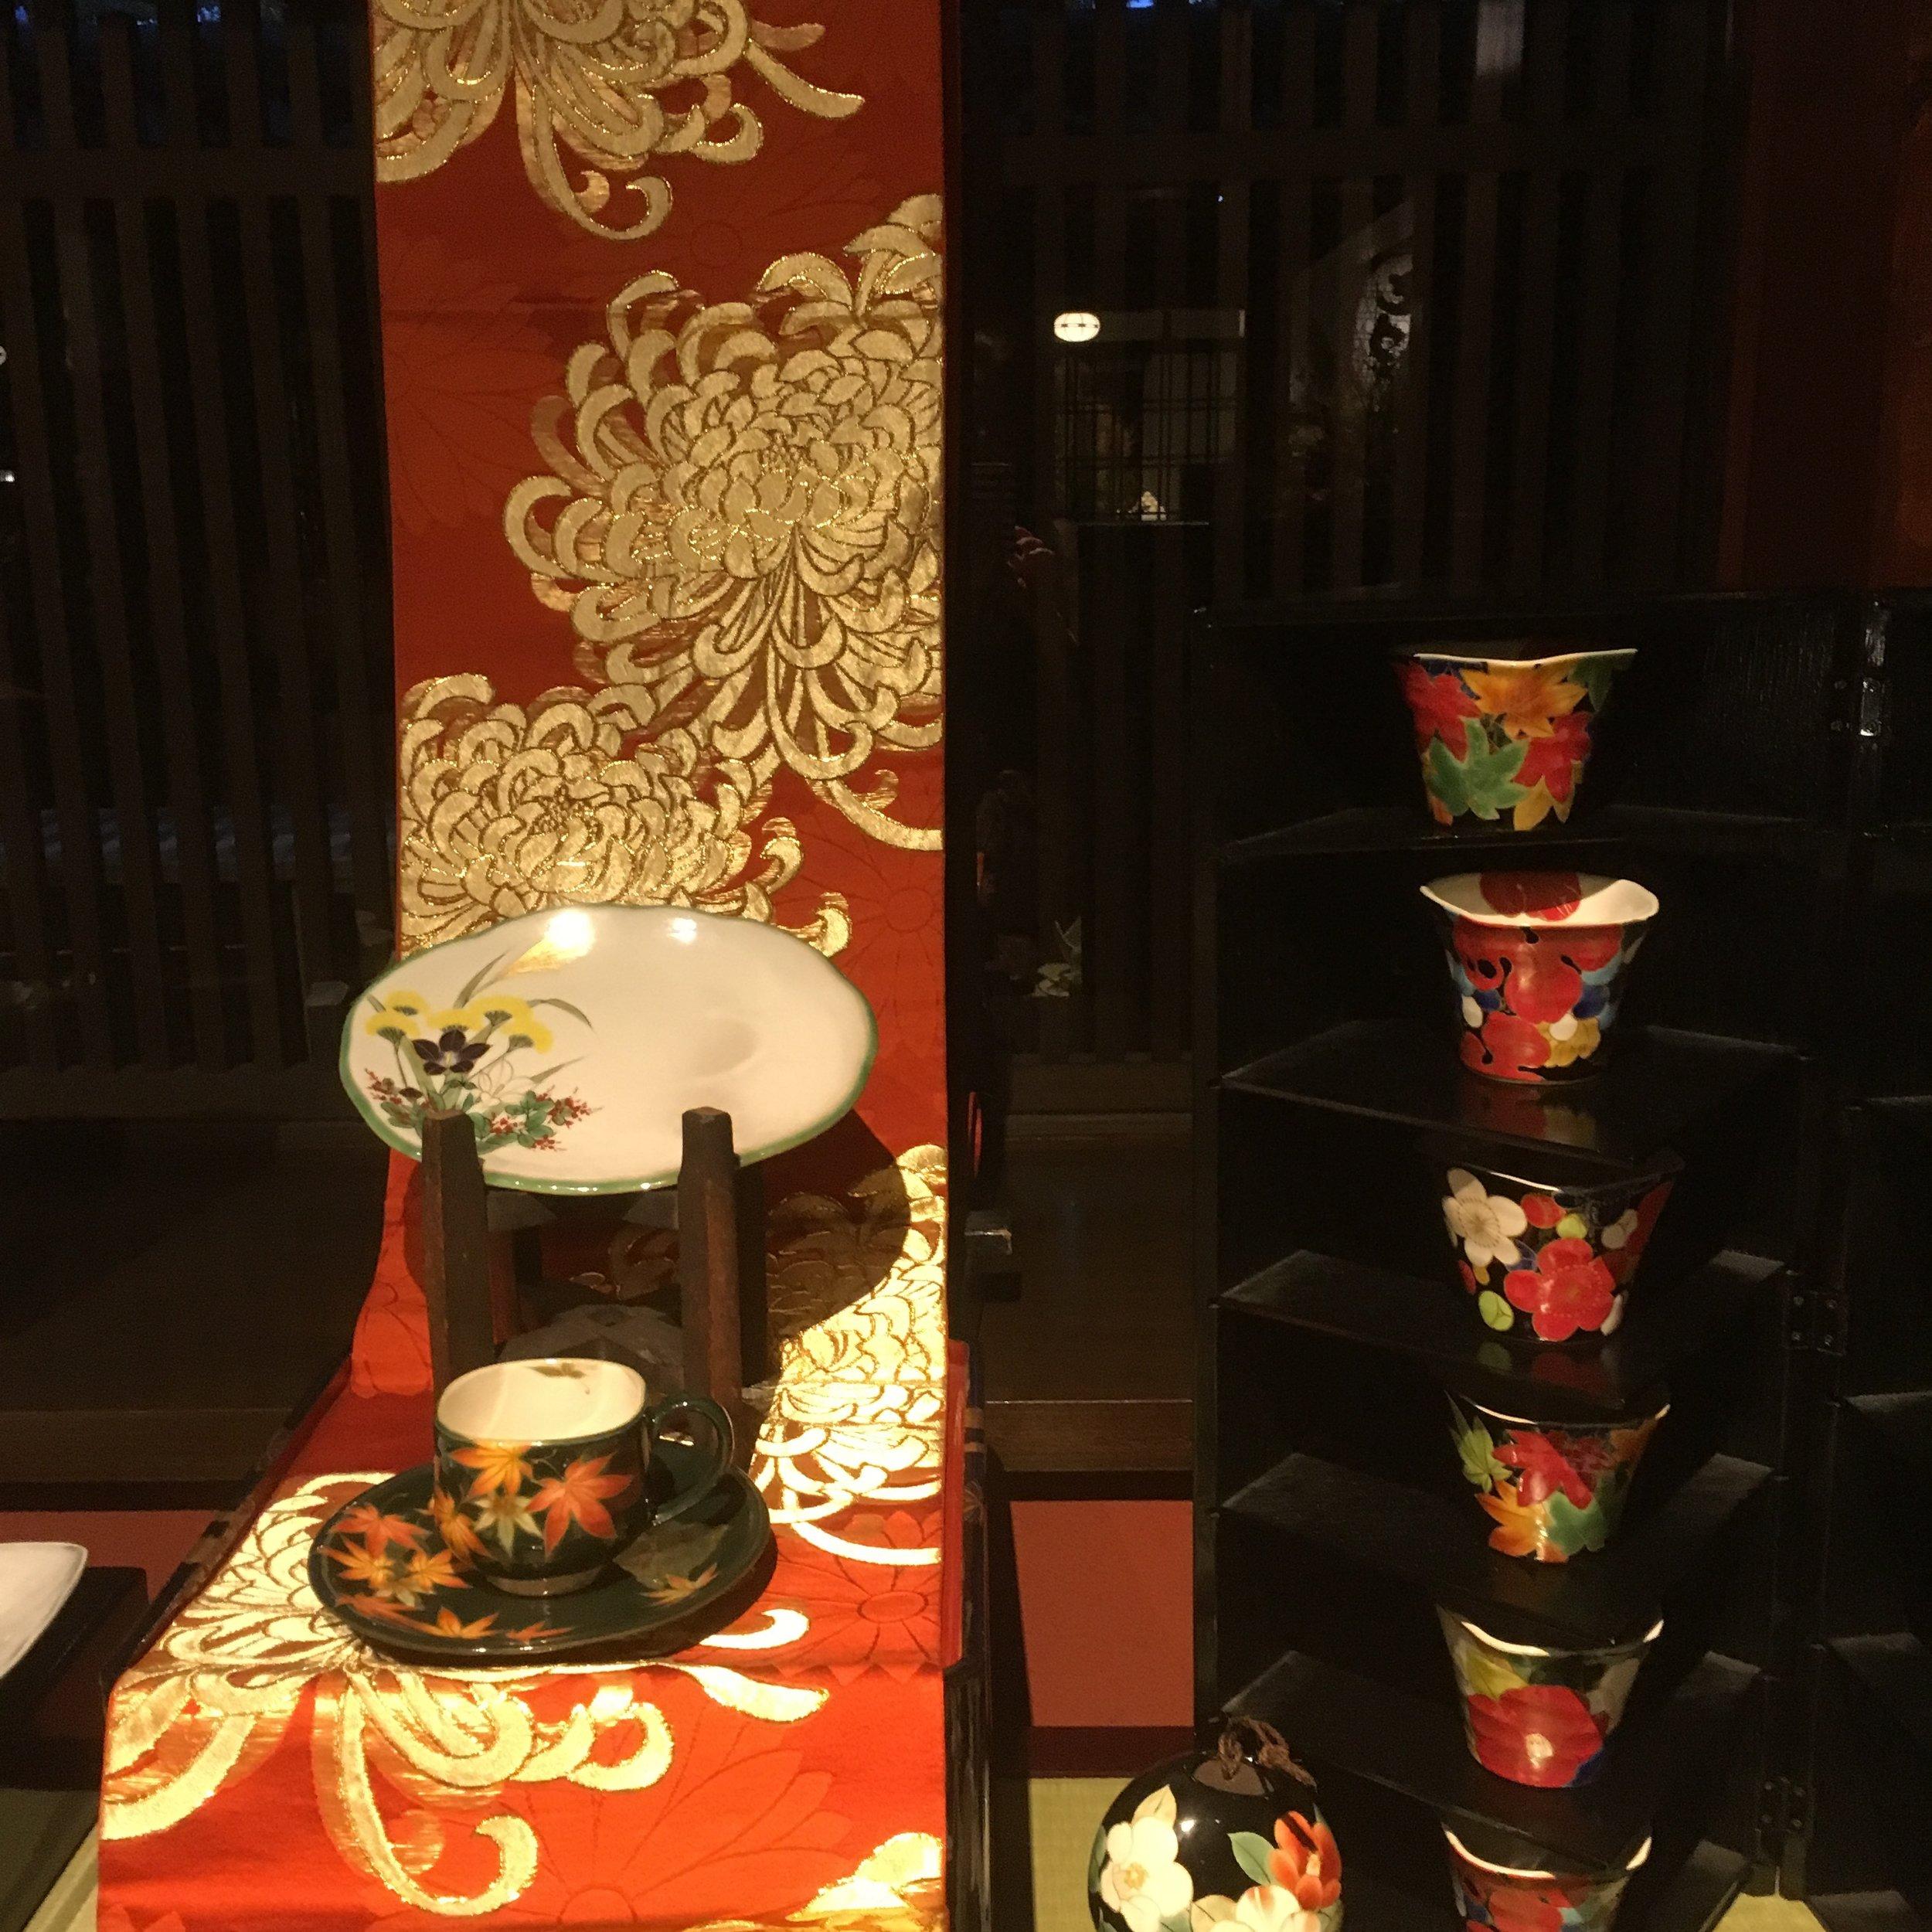 Autumn themed tableware on display